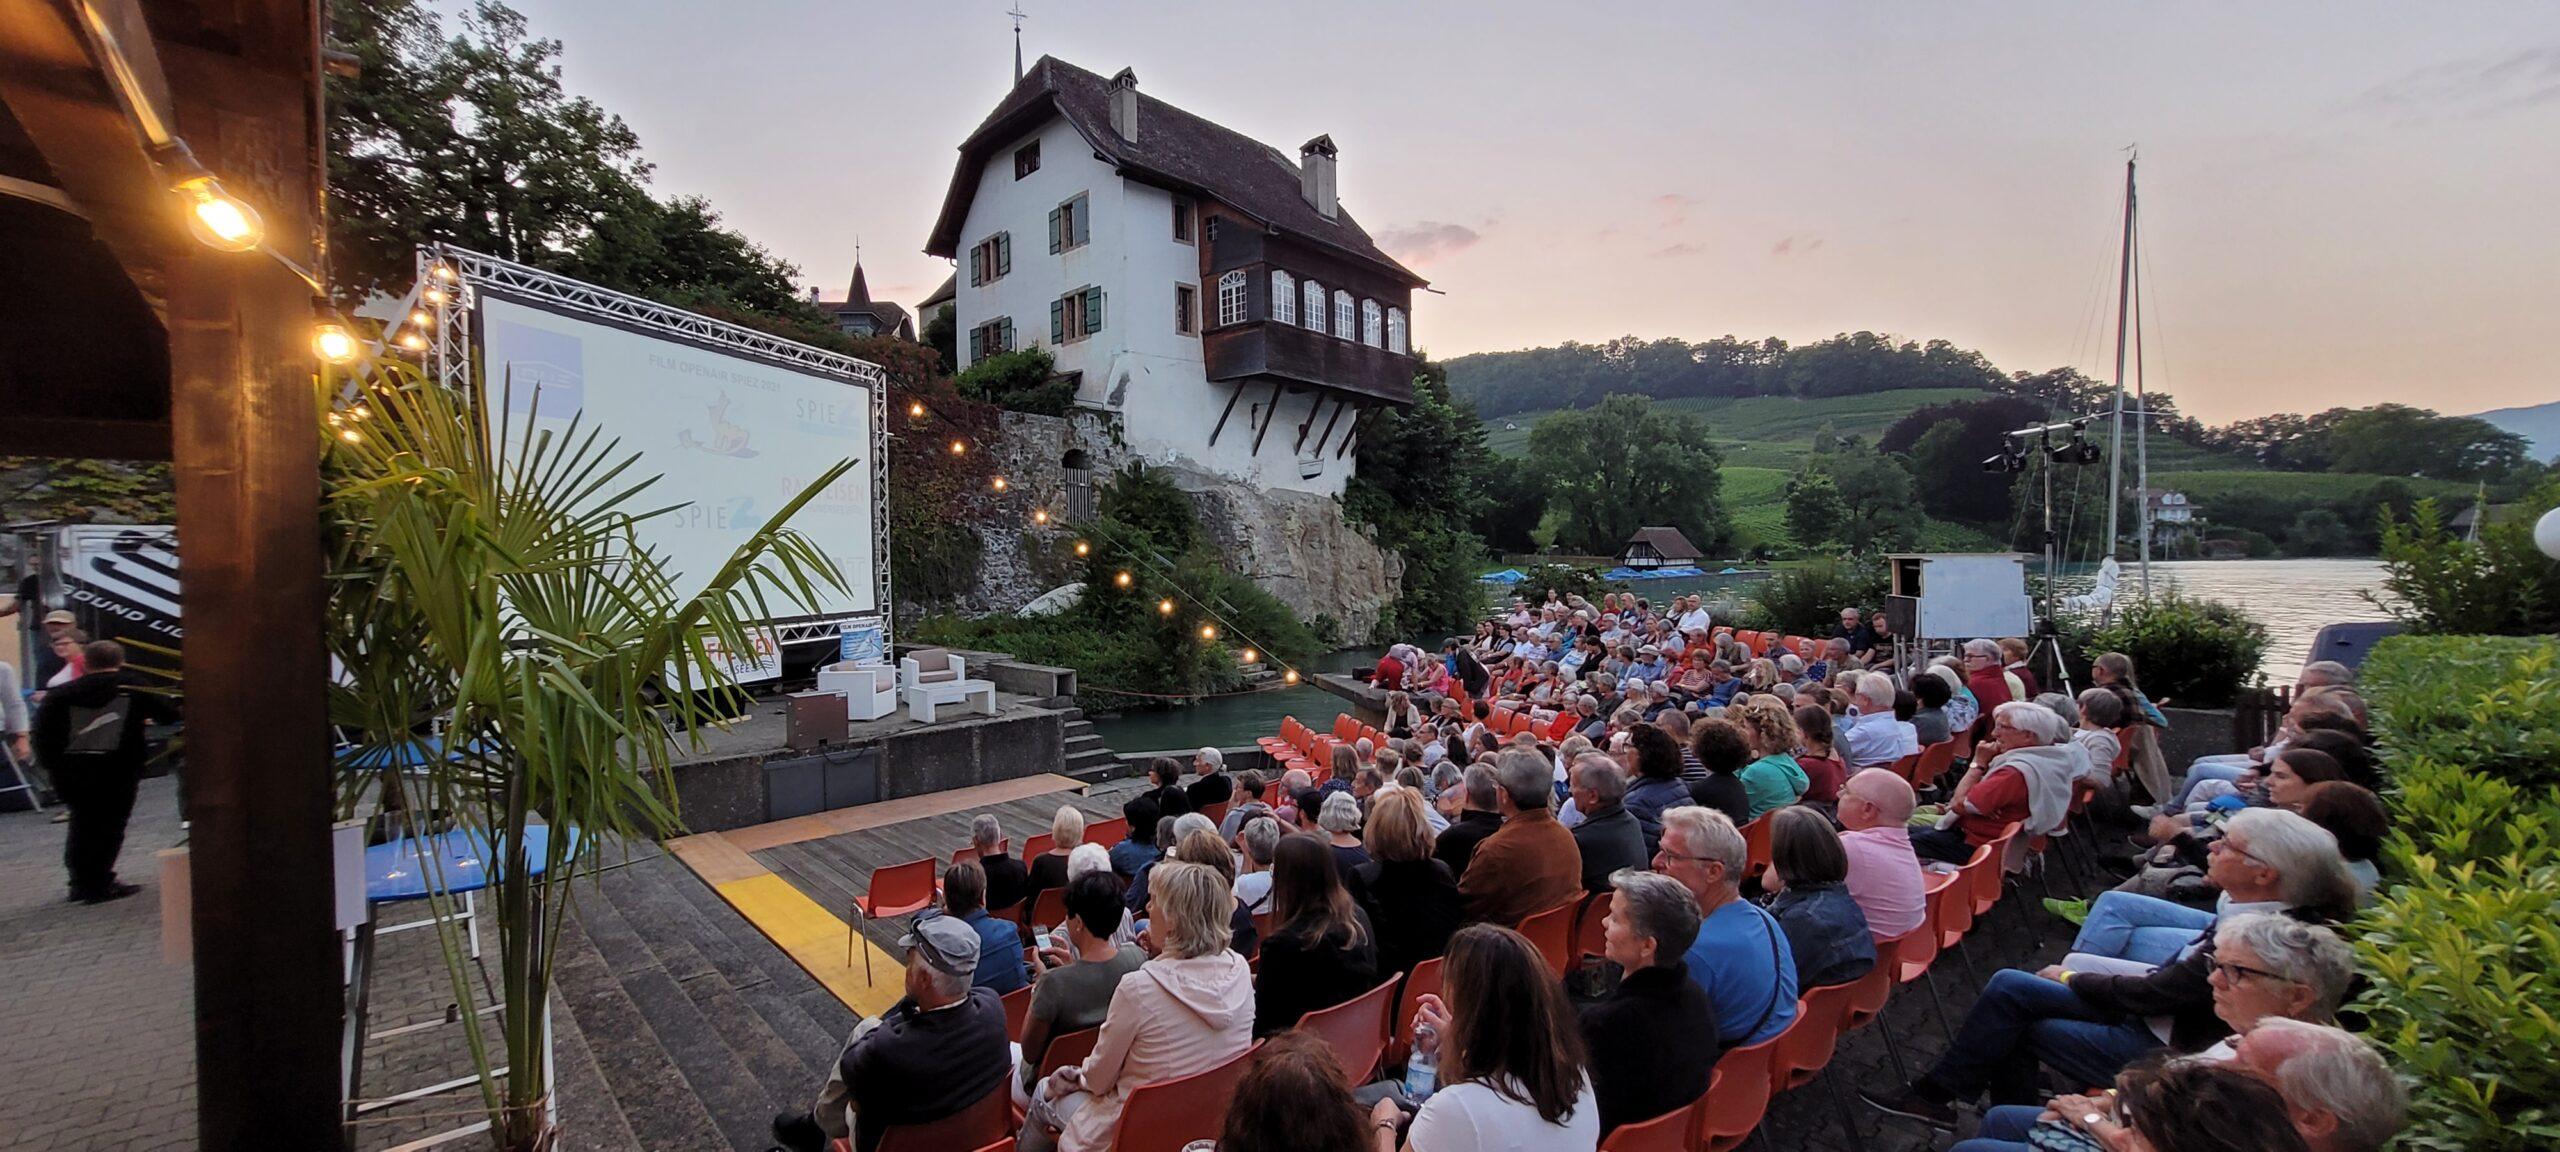 Openair Kino Spiez 2021